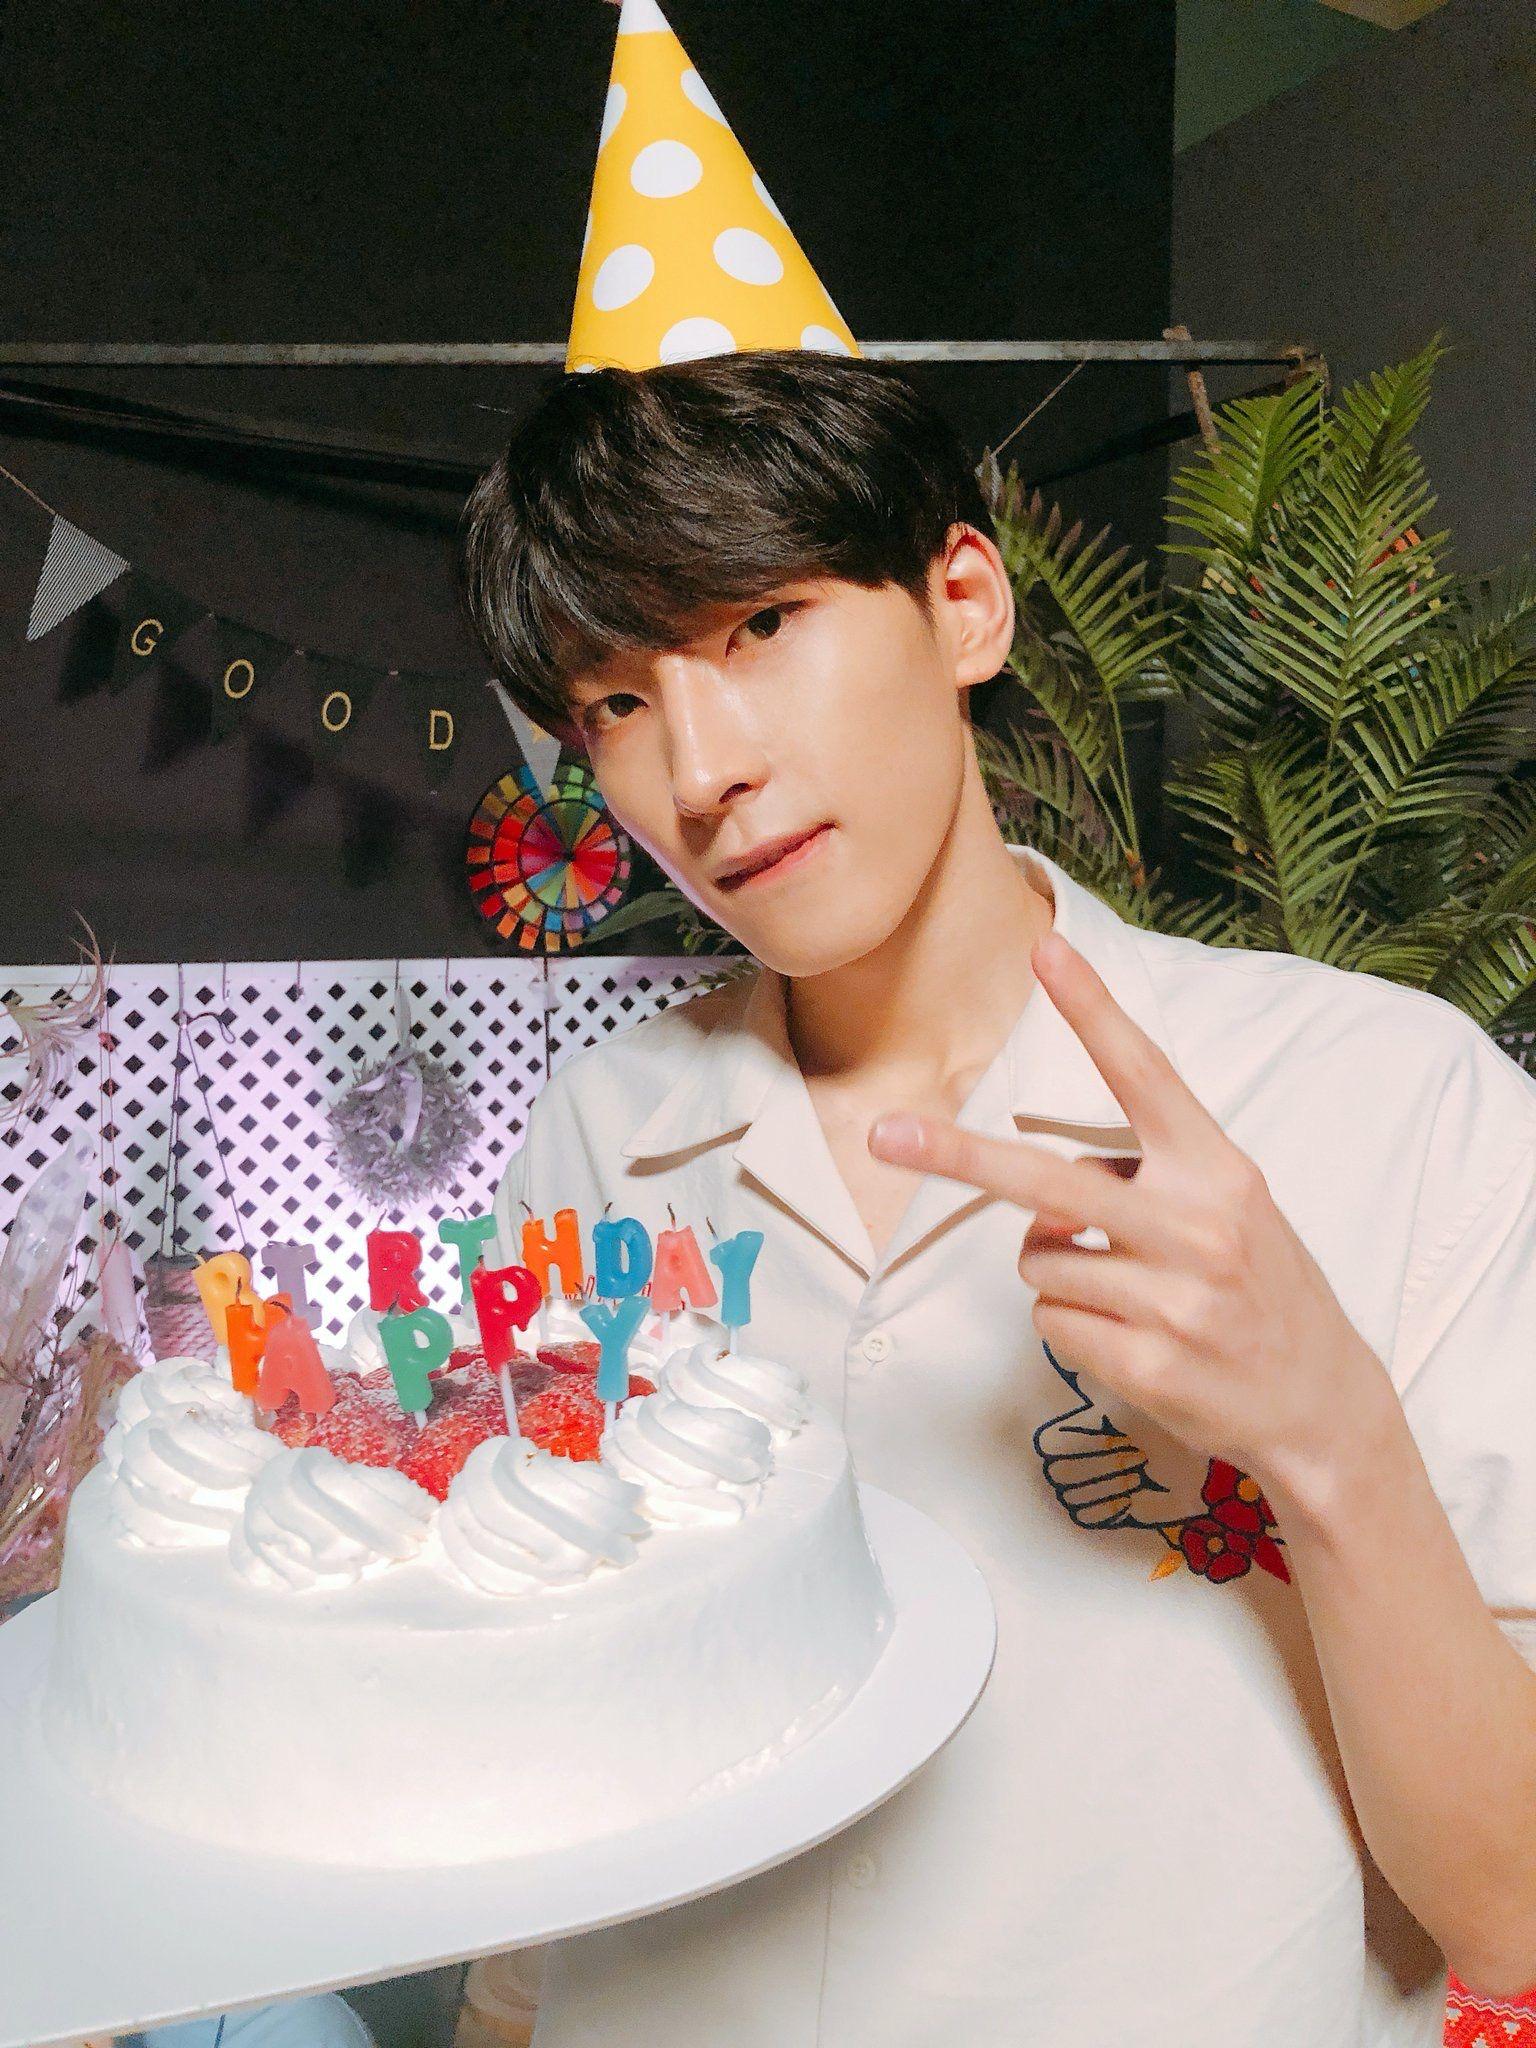 17 December Birthday Kpop